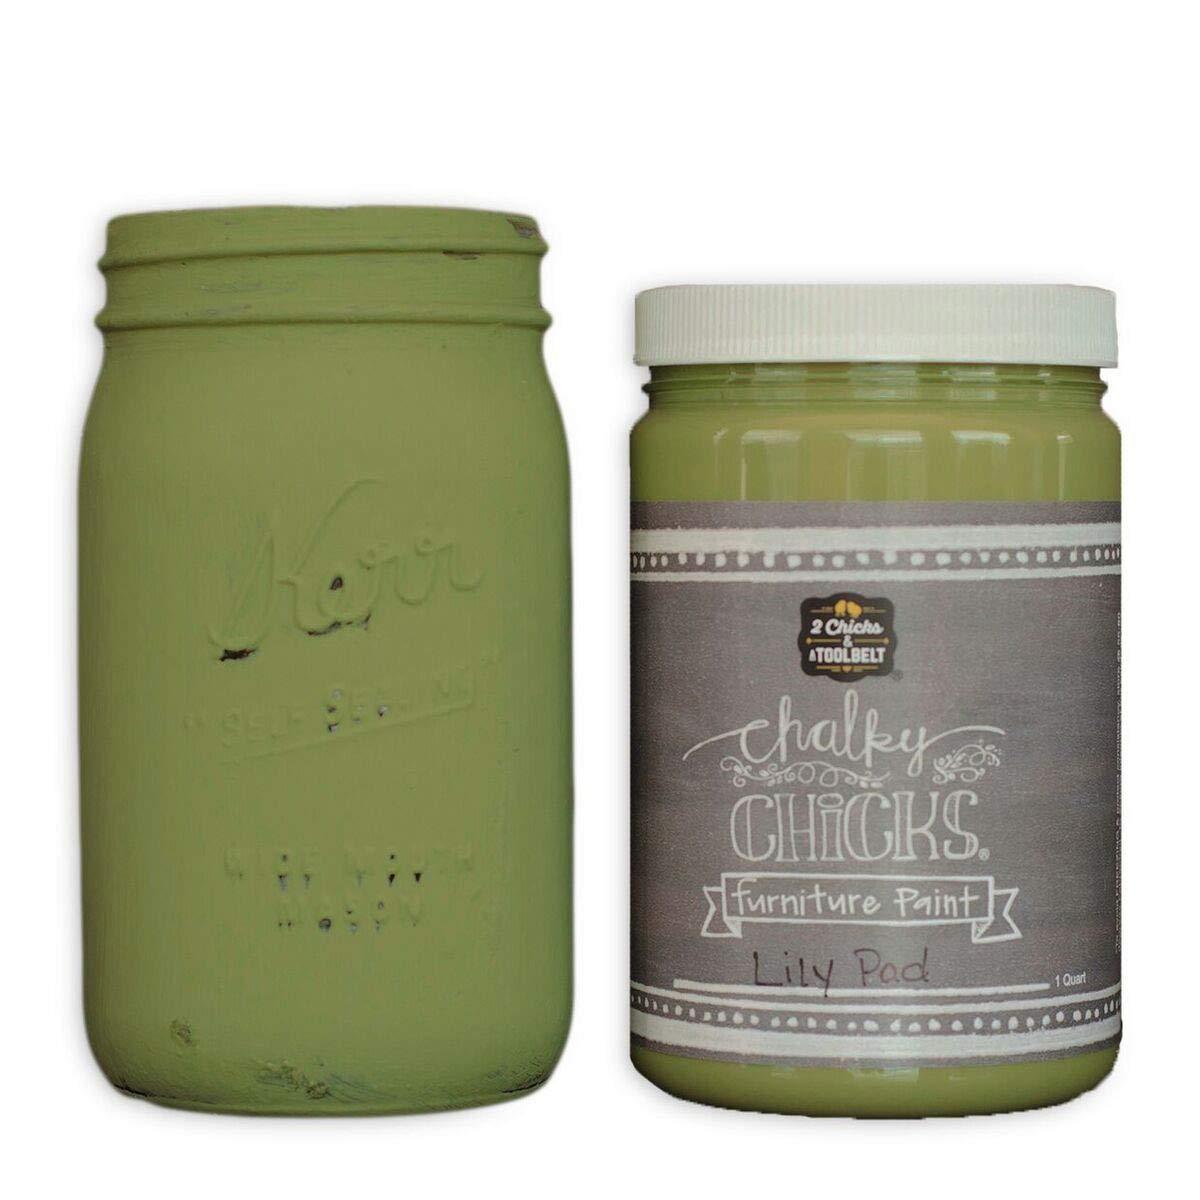 Chalk Finish Paint - Furniture & Cabinet Paint (32 oz, Lily Pad)